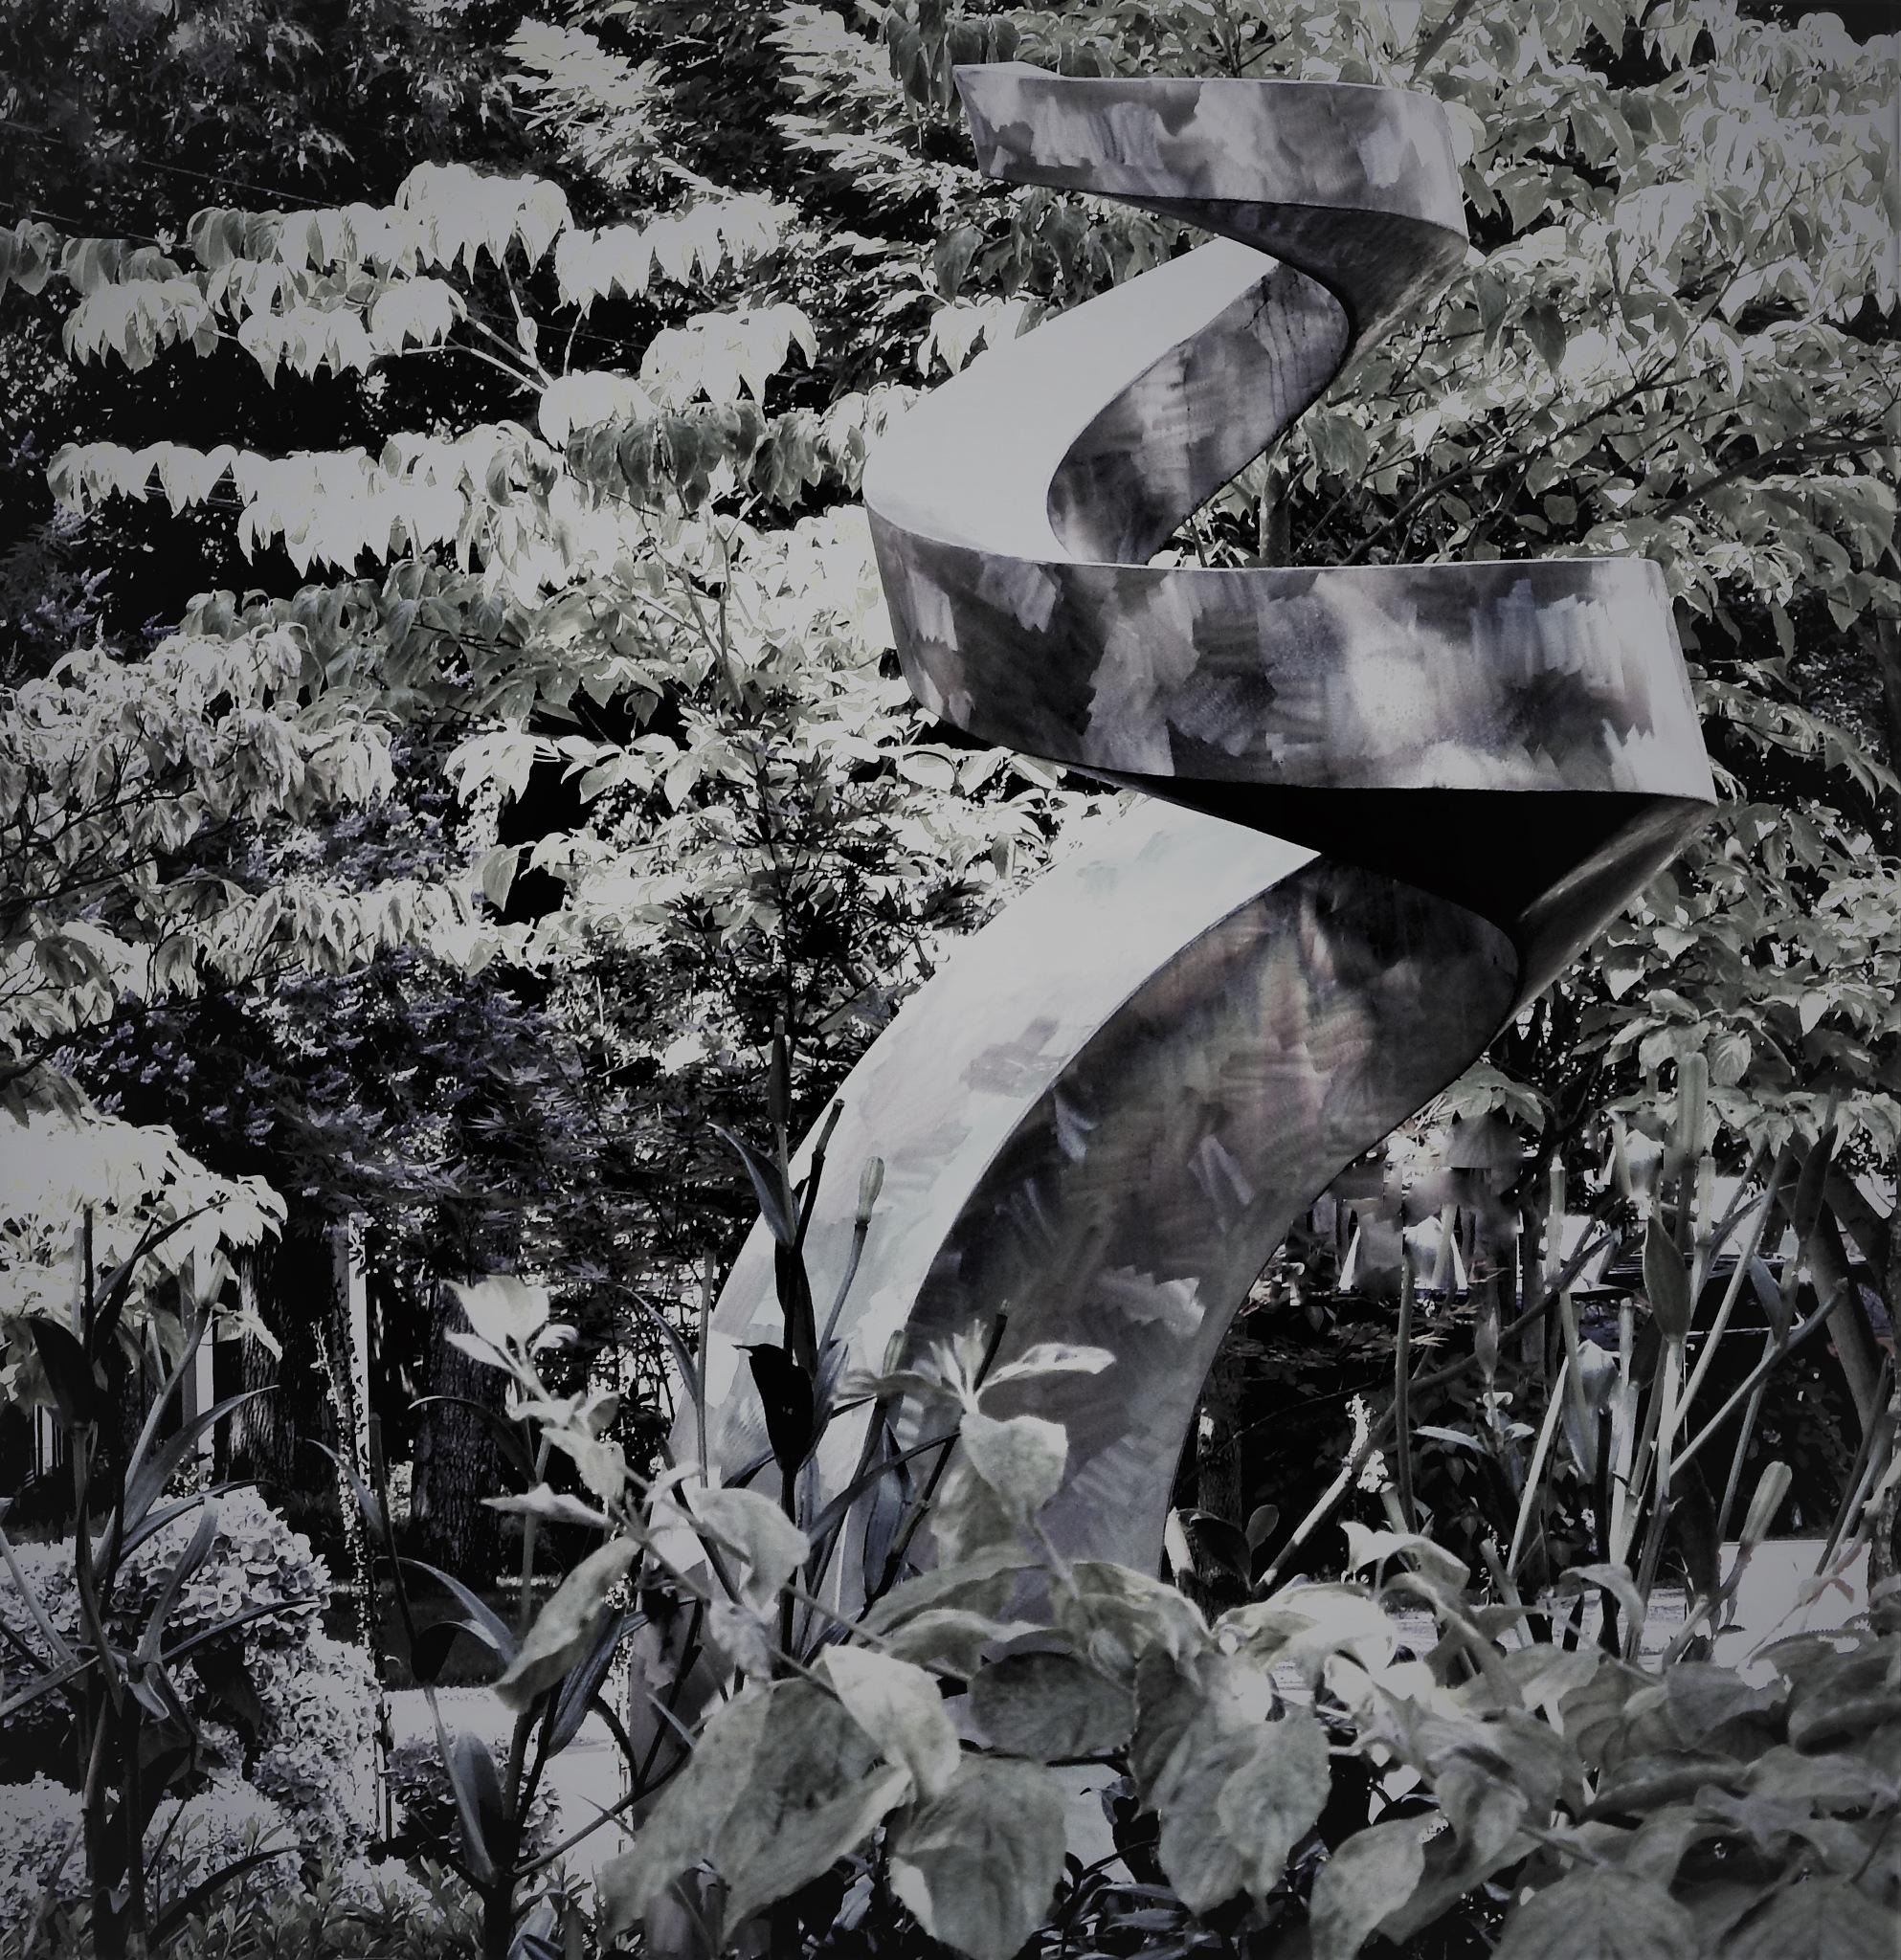 Sculpture by Susan Harrison